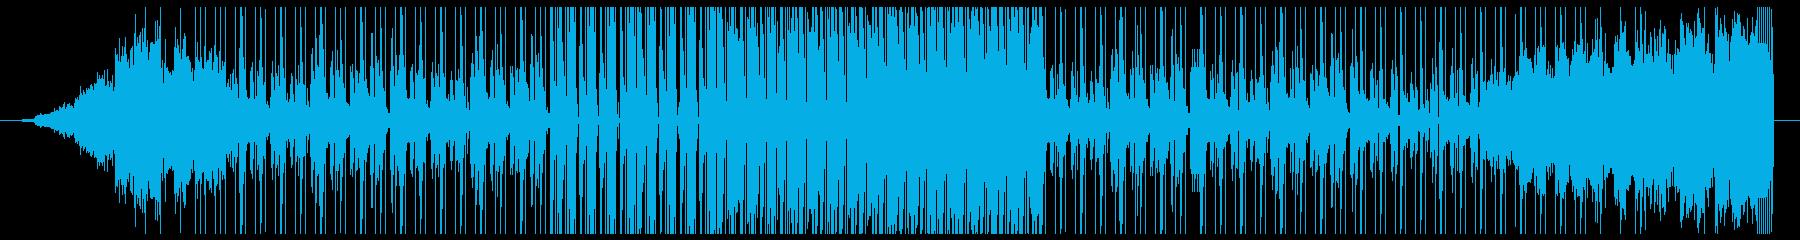 R&BのトラックをイメージしたBGMの再生済みの波形